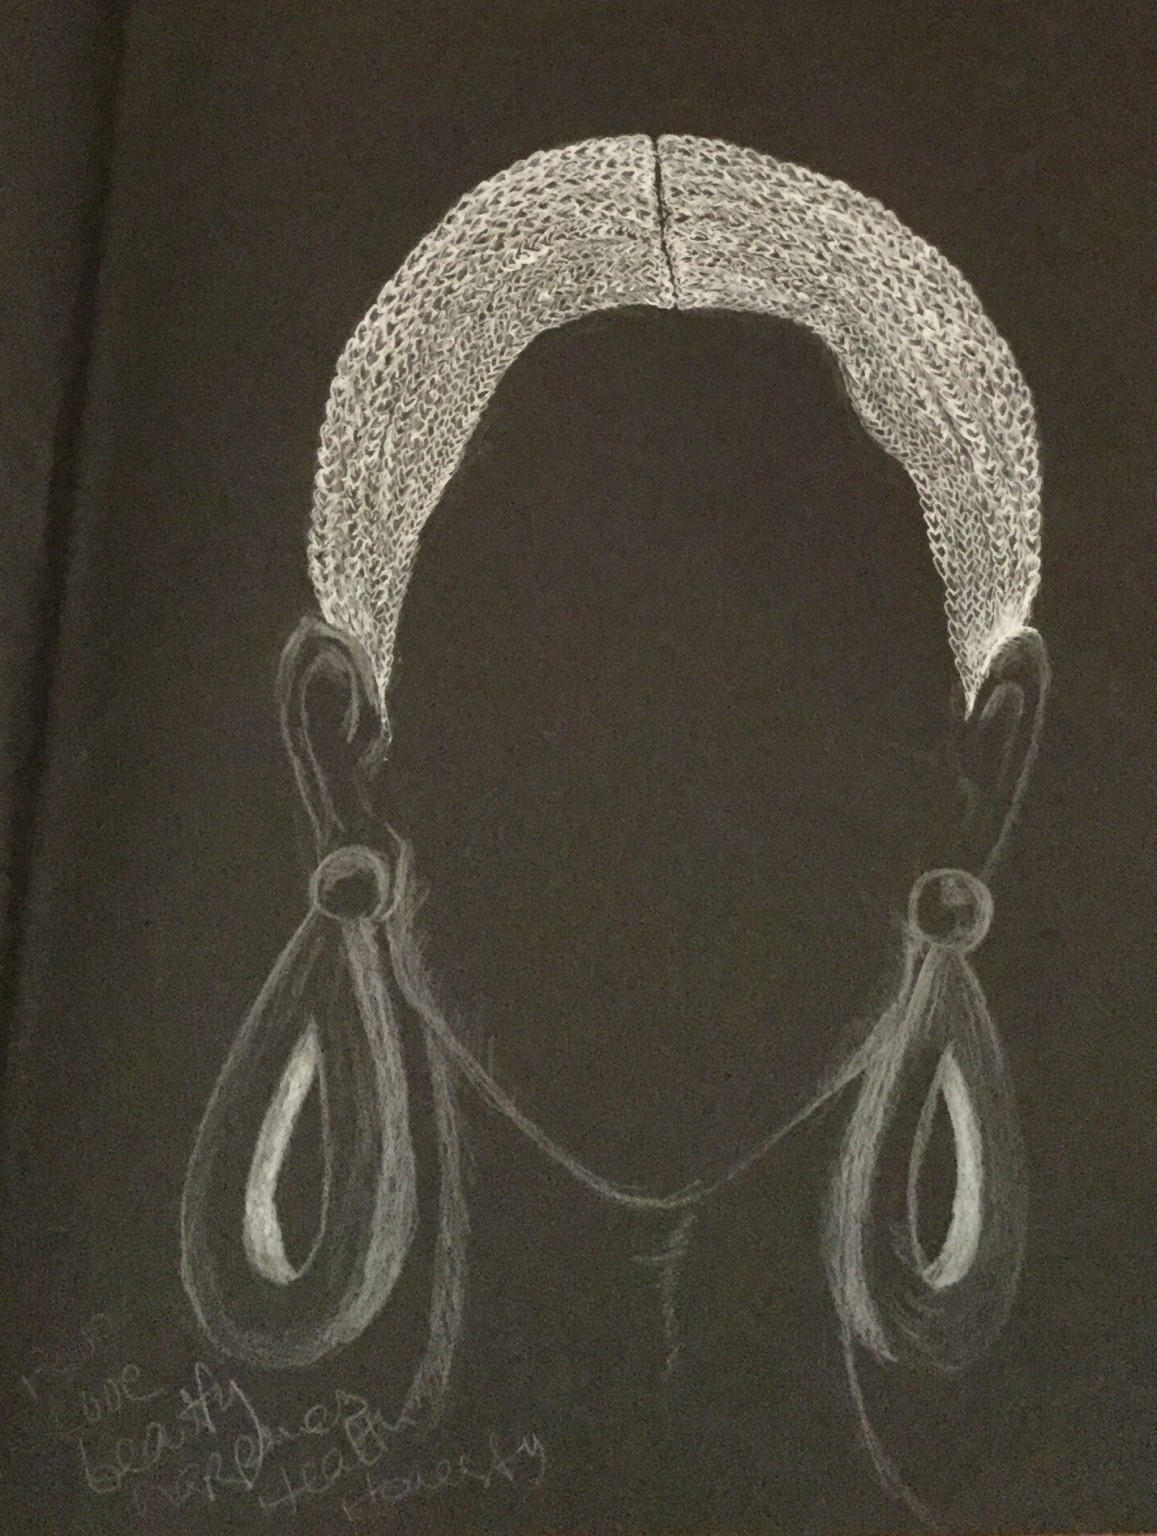 Cornrows, Afro hair, identity,